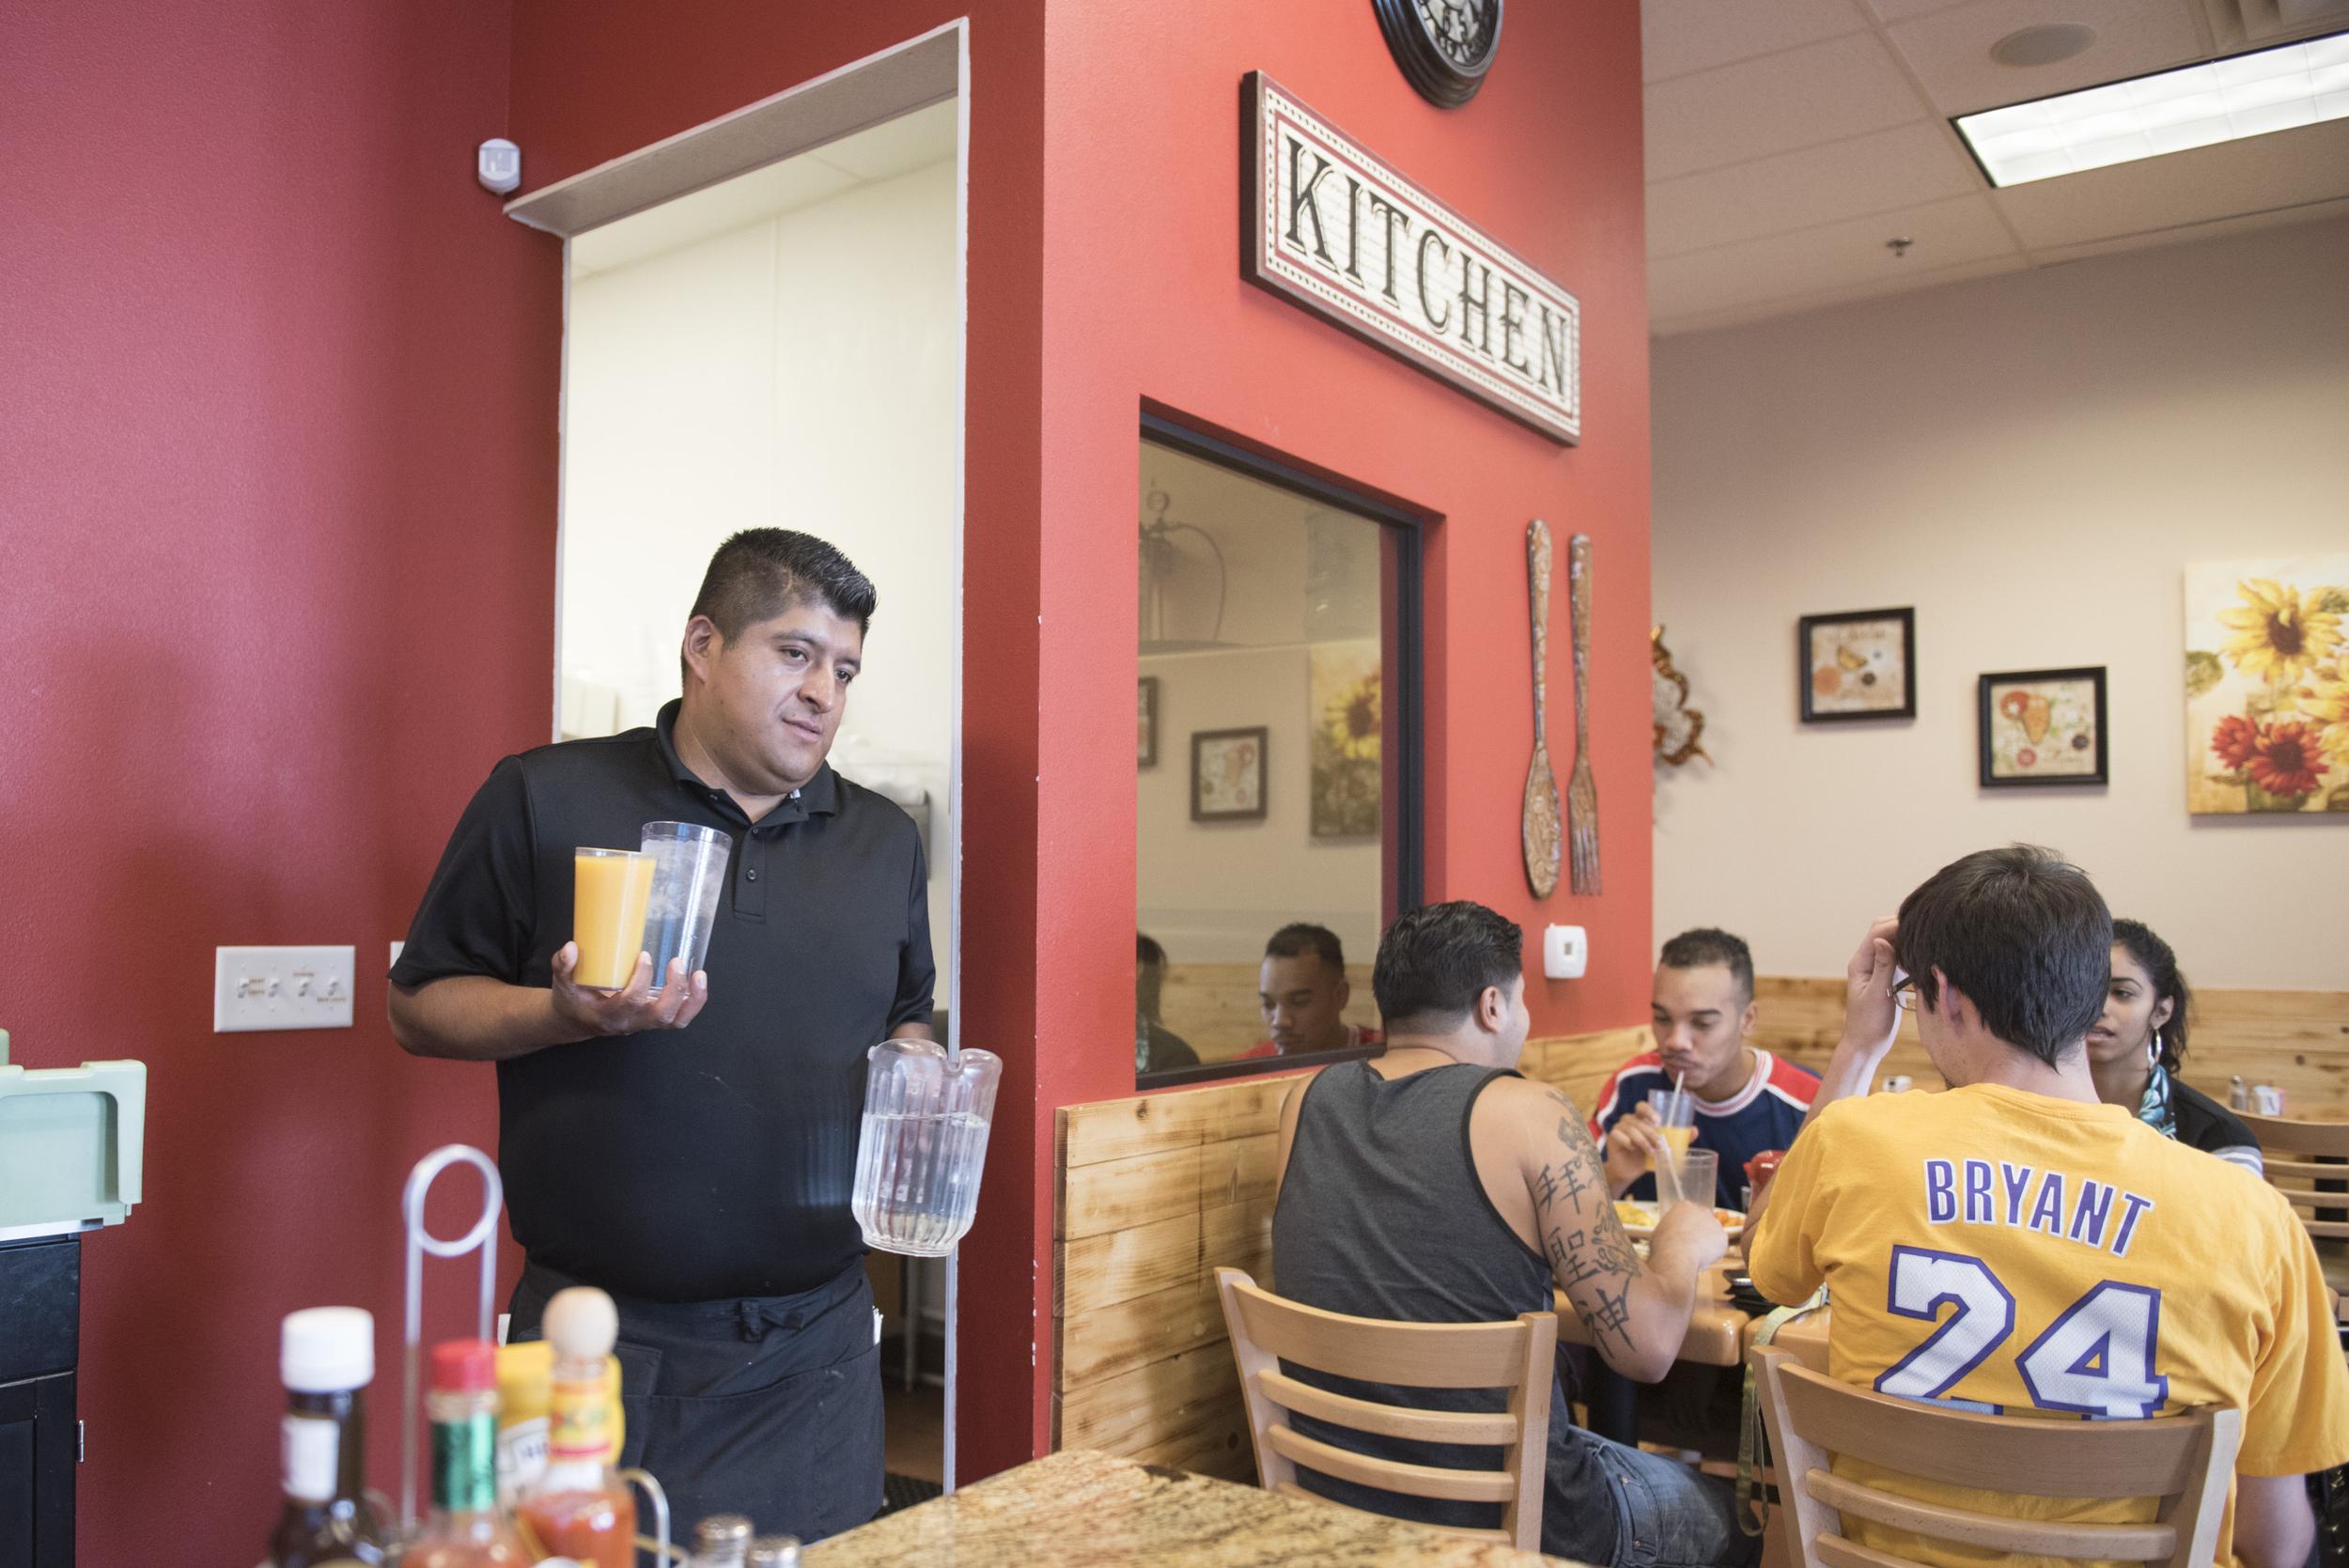 Restaurant manager, Efrain Joachin, brings food to customers at BabyStacks in Henderson, Friday, June 26, 2015.(Jason Ogulnik/Las Vegas Review-Journal)